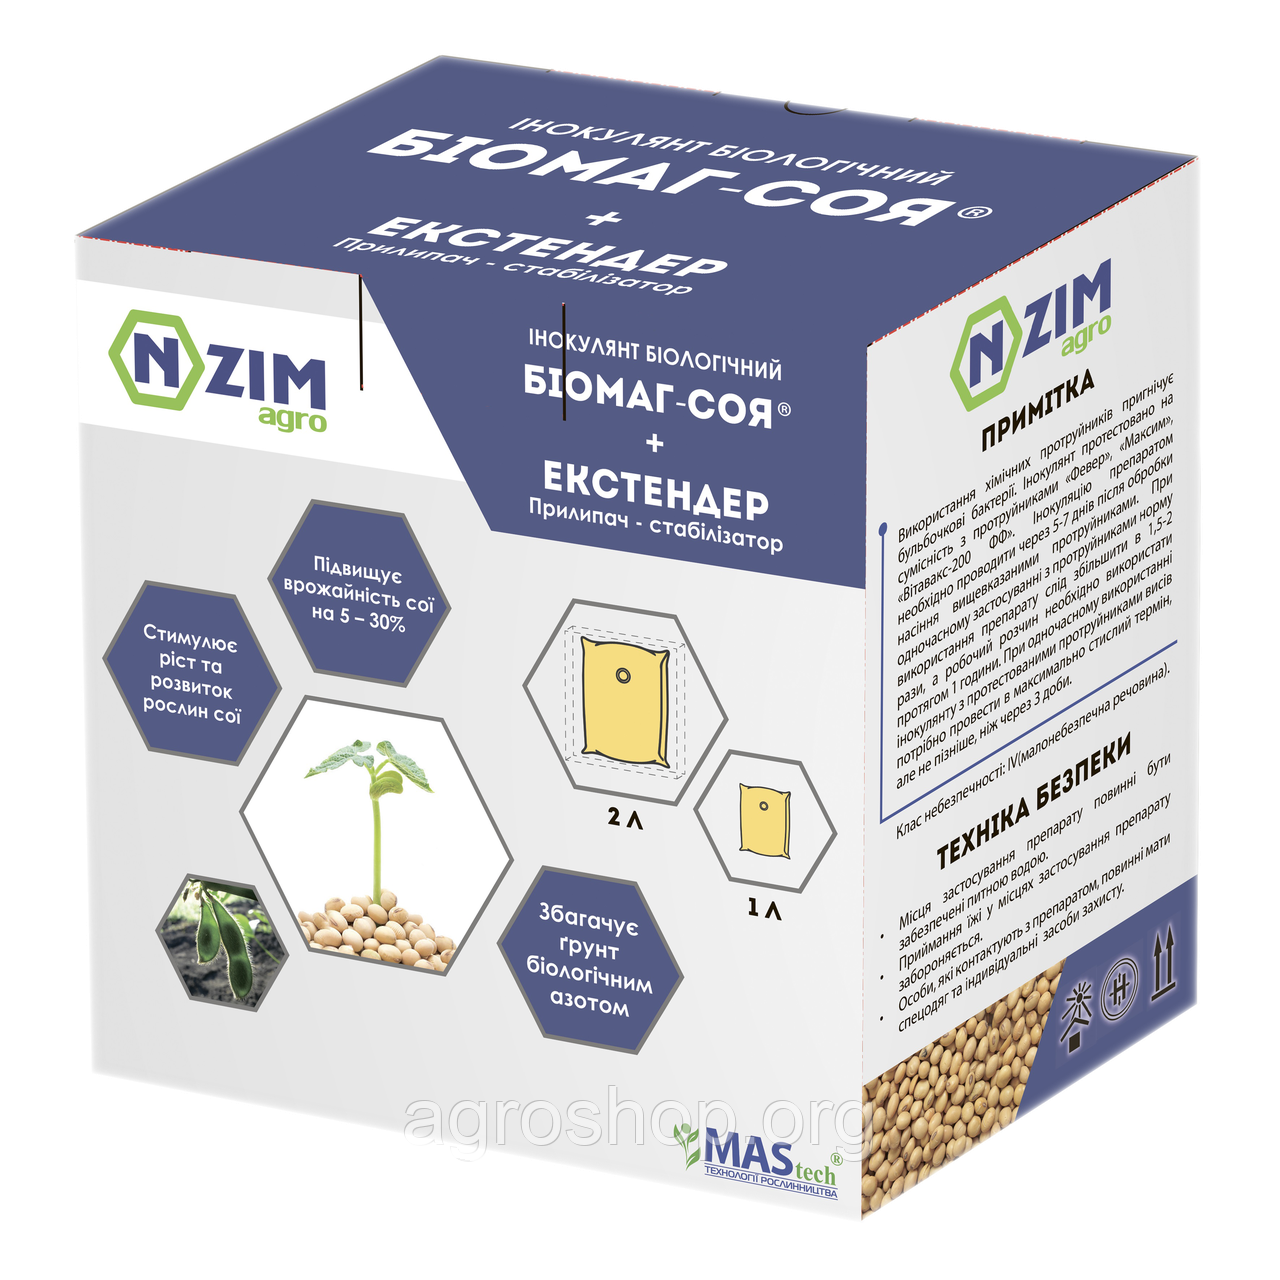 Биомаг-Соя.  Азотфиксирующуй инокулянт для сои